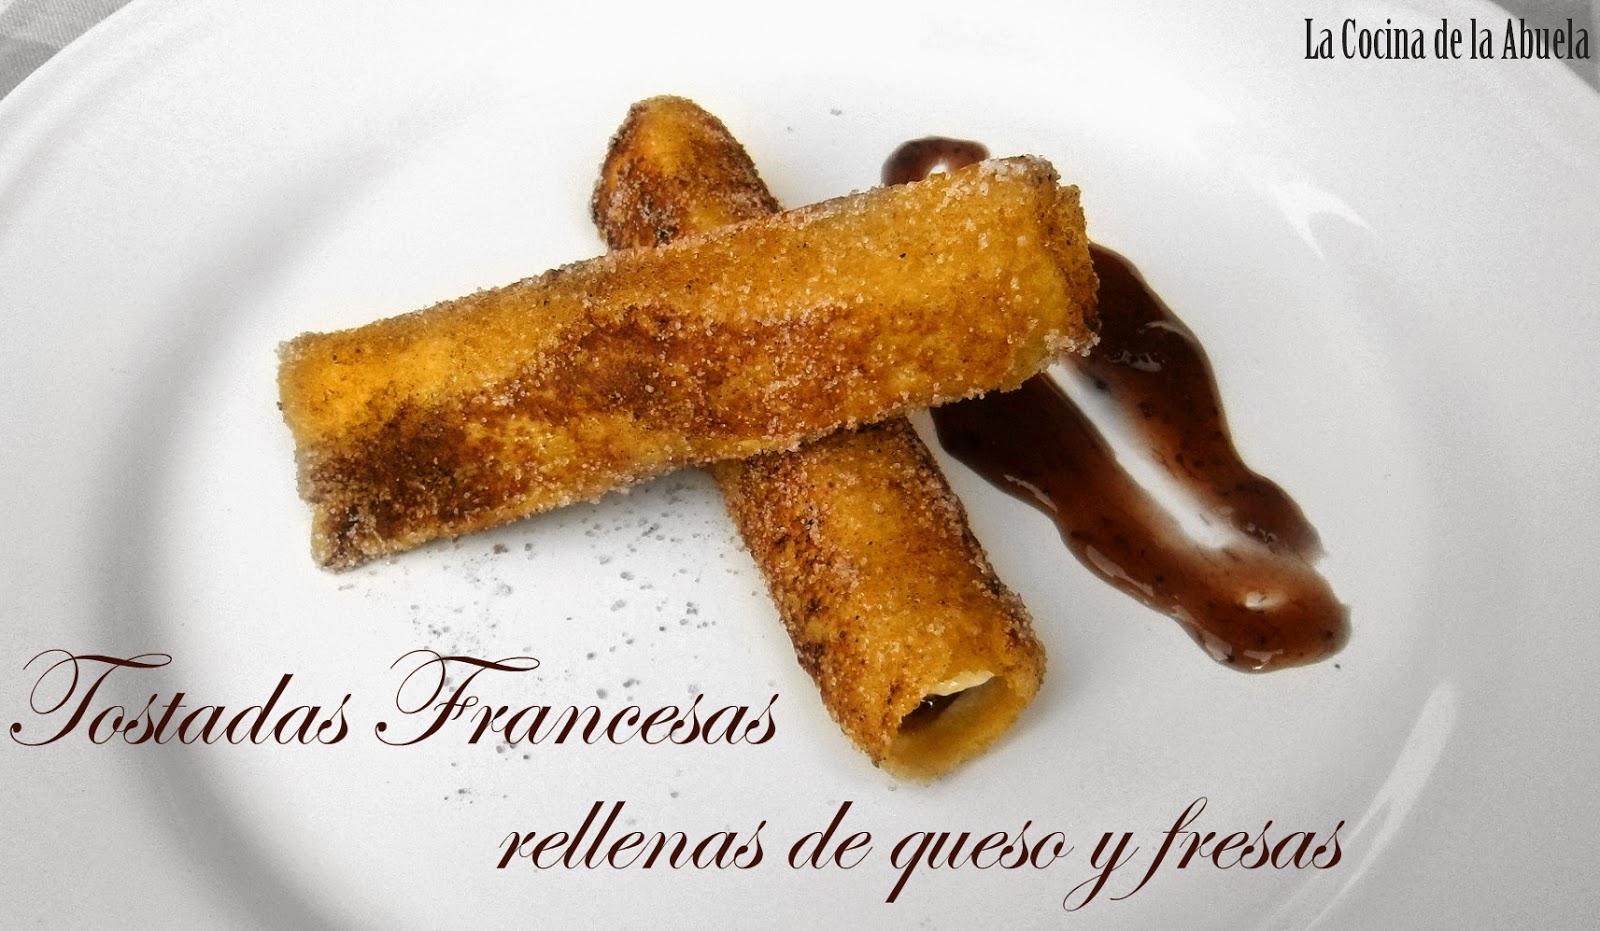 Tostadas Francesas Enrolladas.